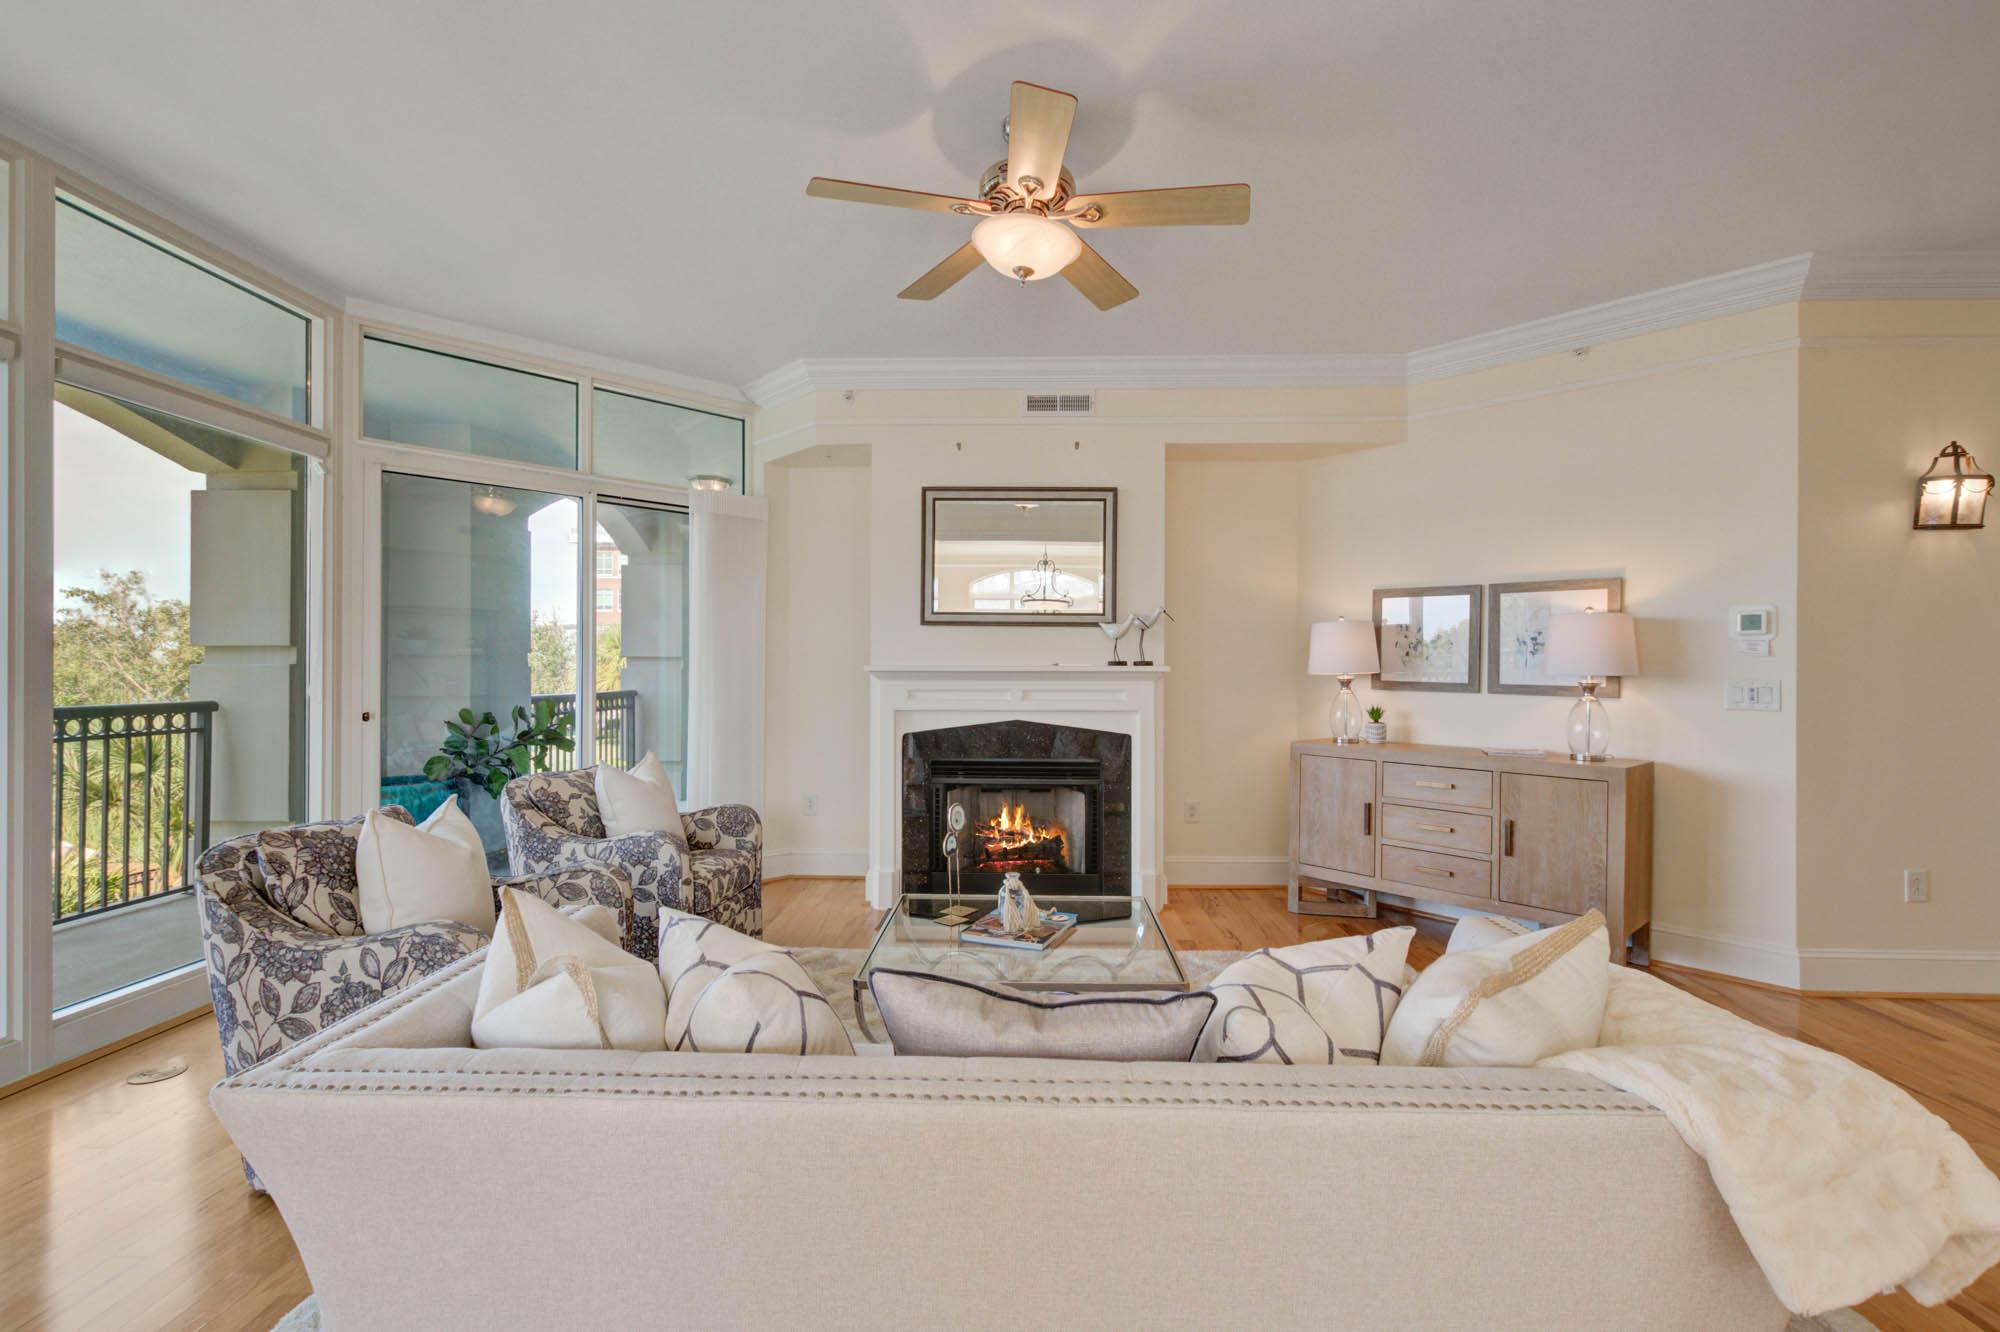 Renaissance On Chas Harbor Homes For Sale - 125 Plaza, Mount Pleasant, SC - 25